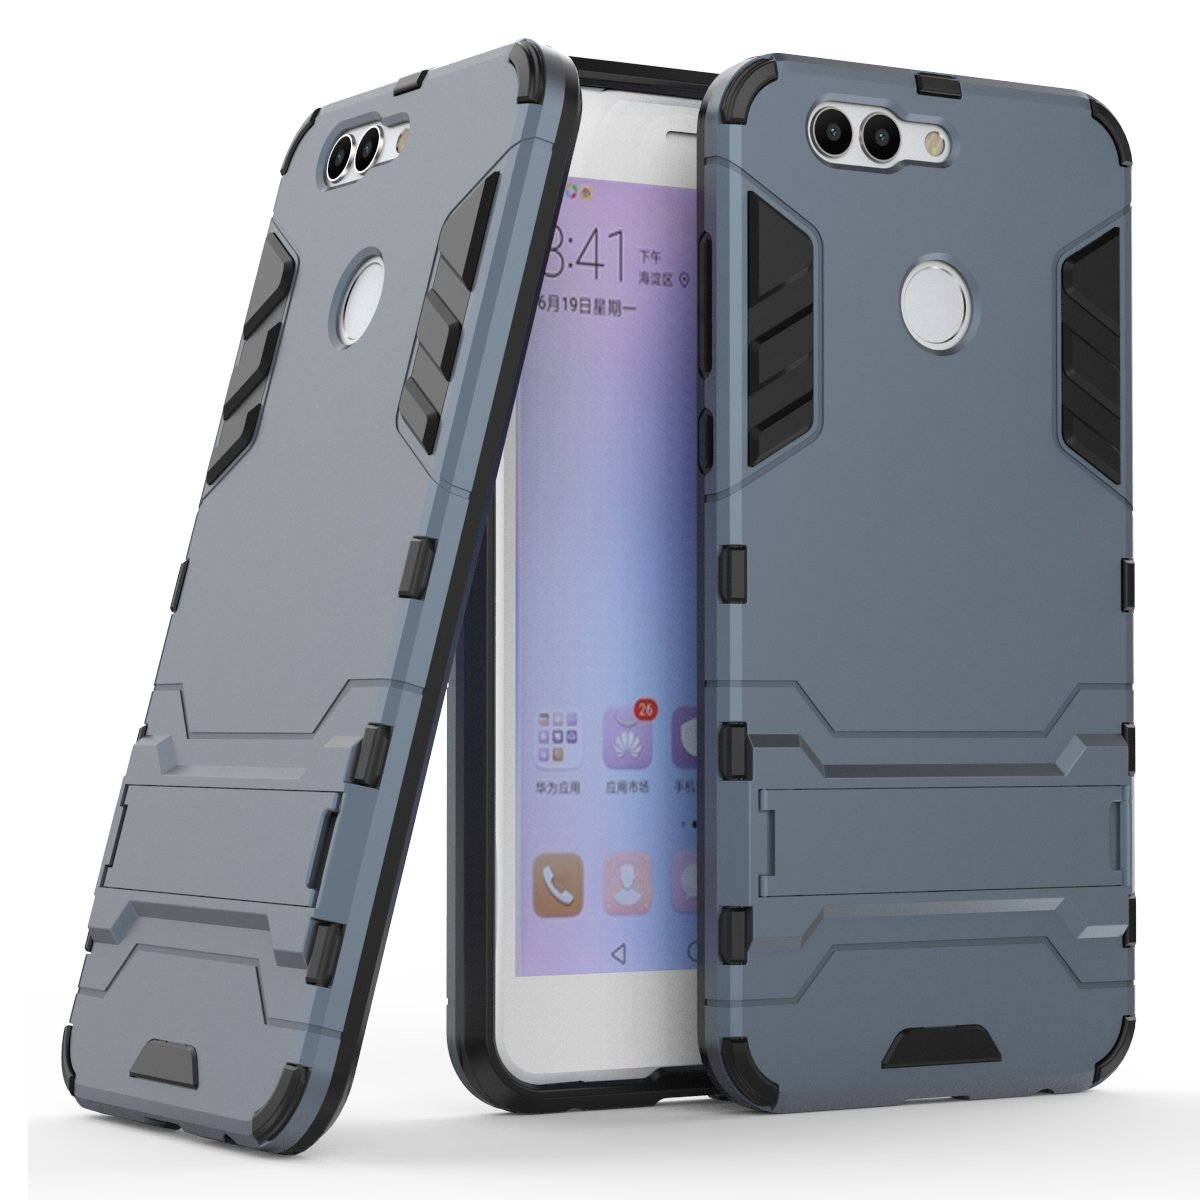 Amazon.com: Huawei Nova 2 Plus Case, Huawei Nova 2 Plus ...